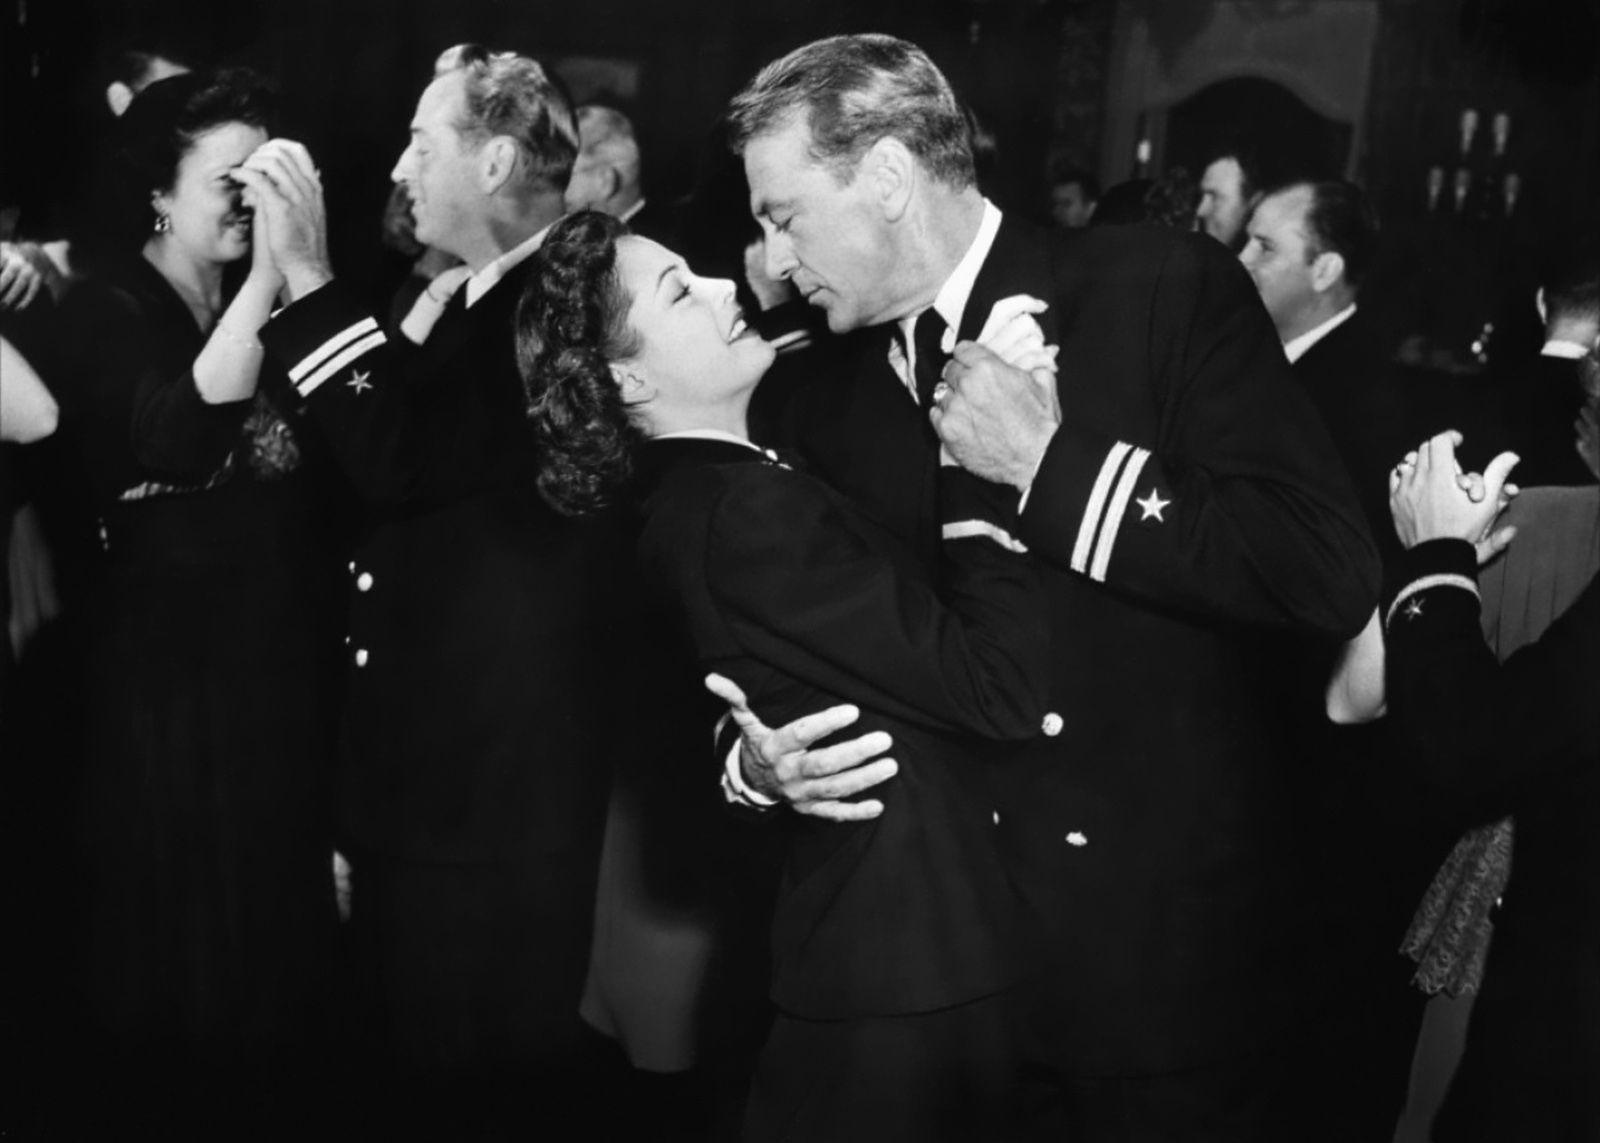 Judy Garland and Liza Minnelli   Judy garland, Judy